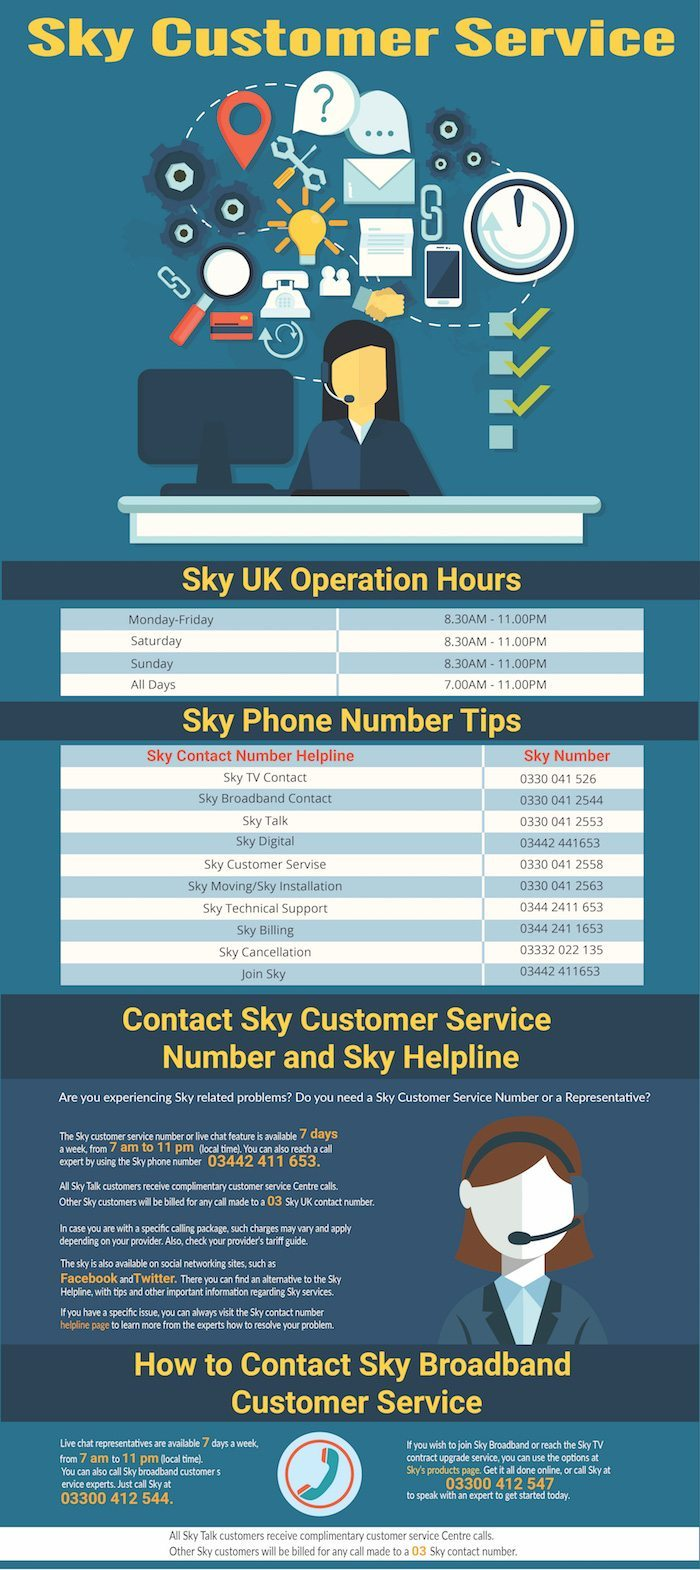 Sky Helpline Customer Service Number 08443069107